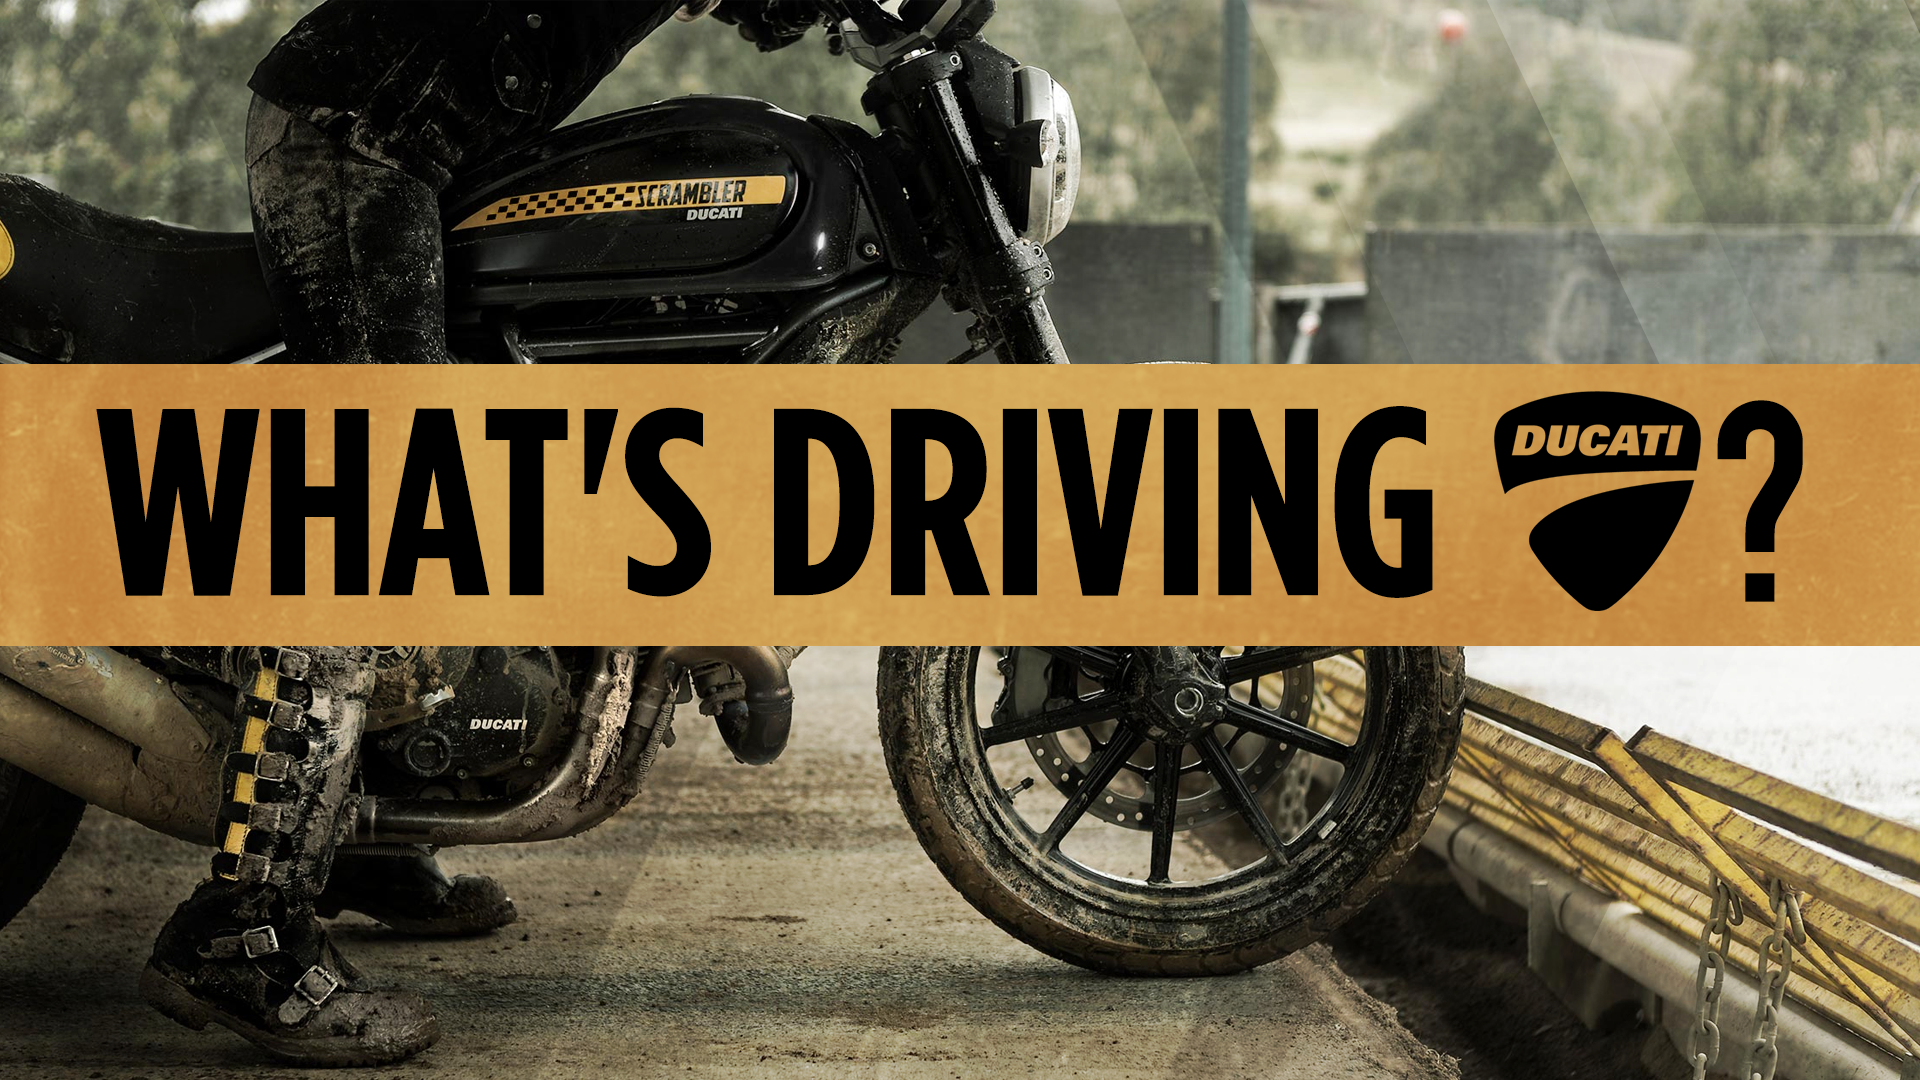 20608409_MM_MF_DRIVING_DUCATI.png